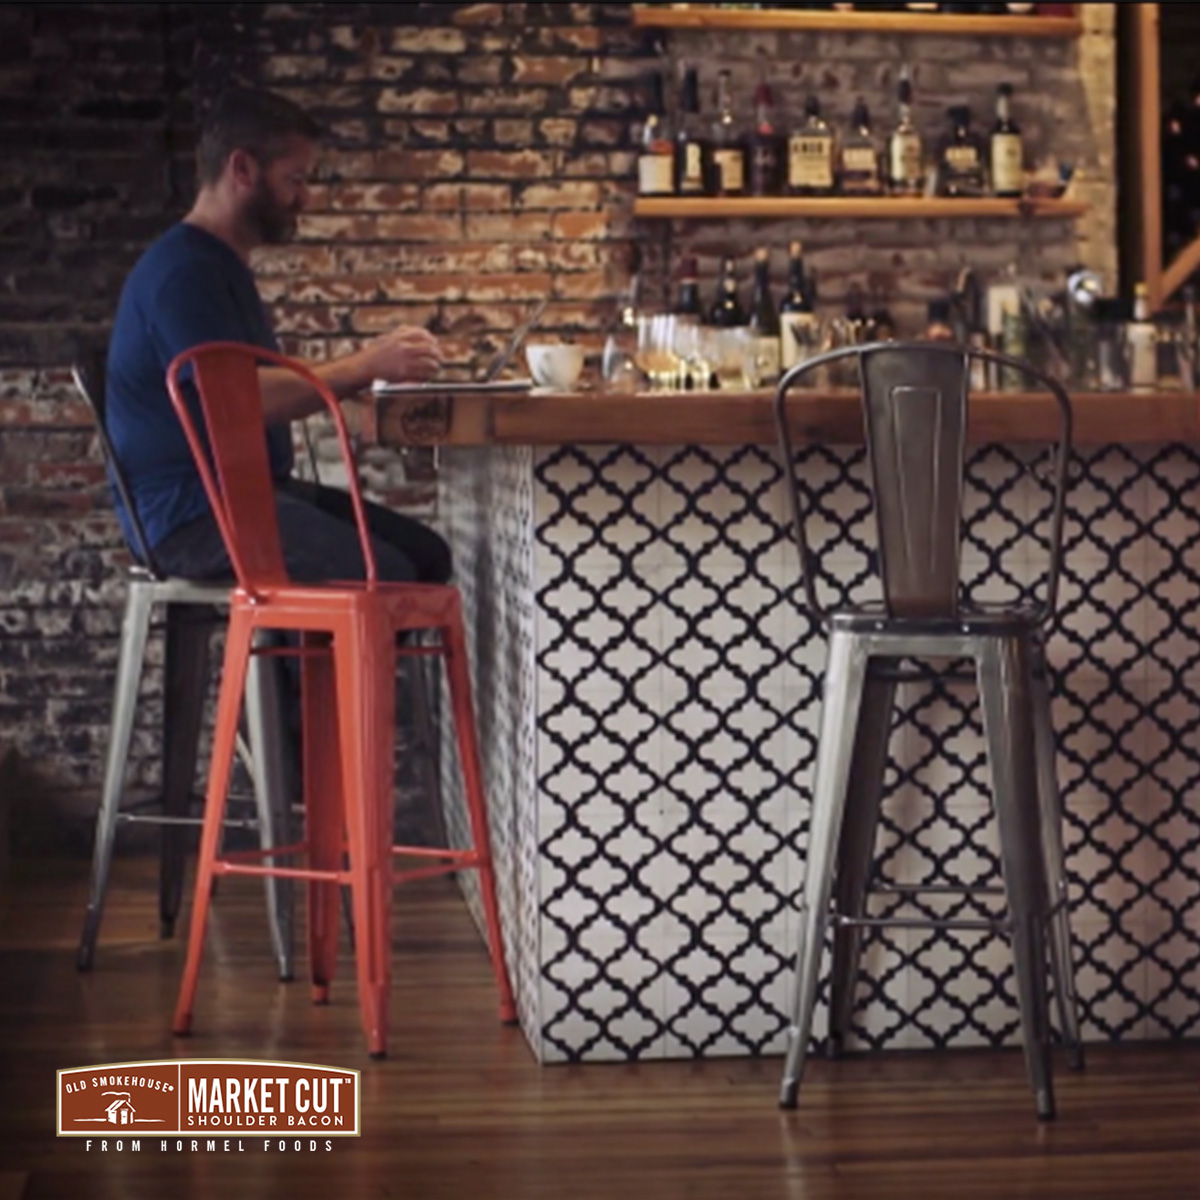 Market Cut Bacon man sitting at bar